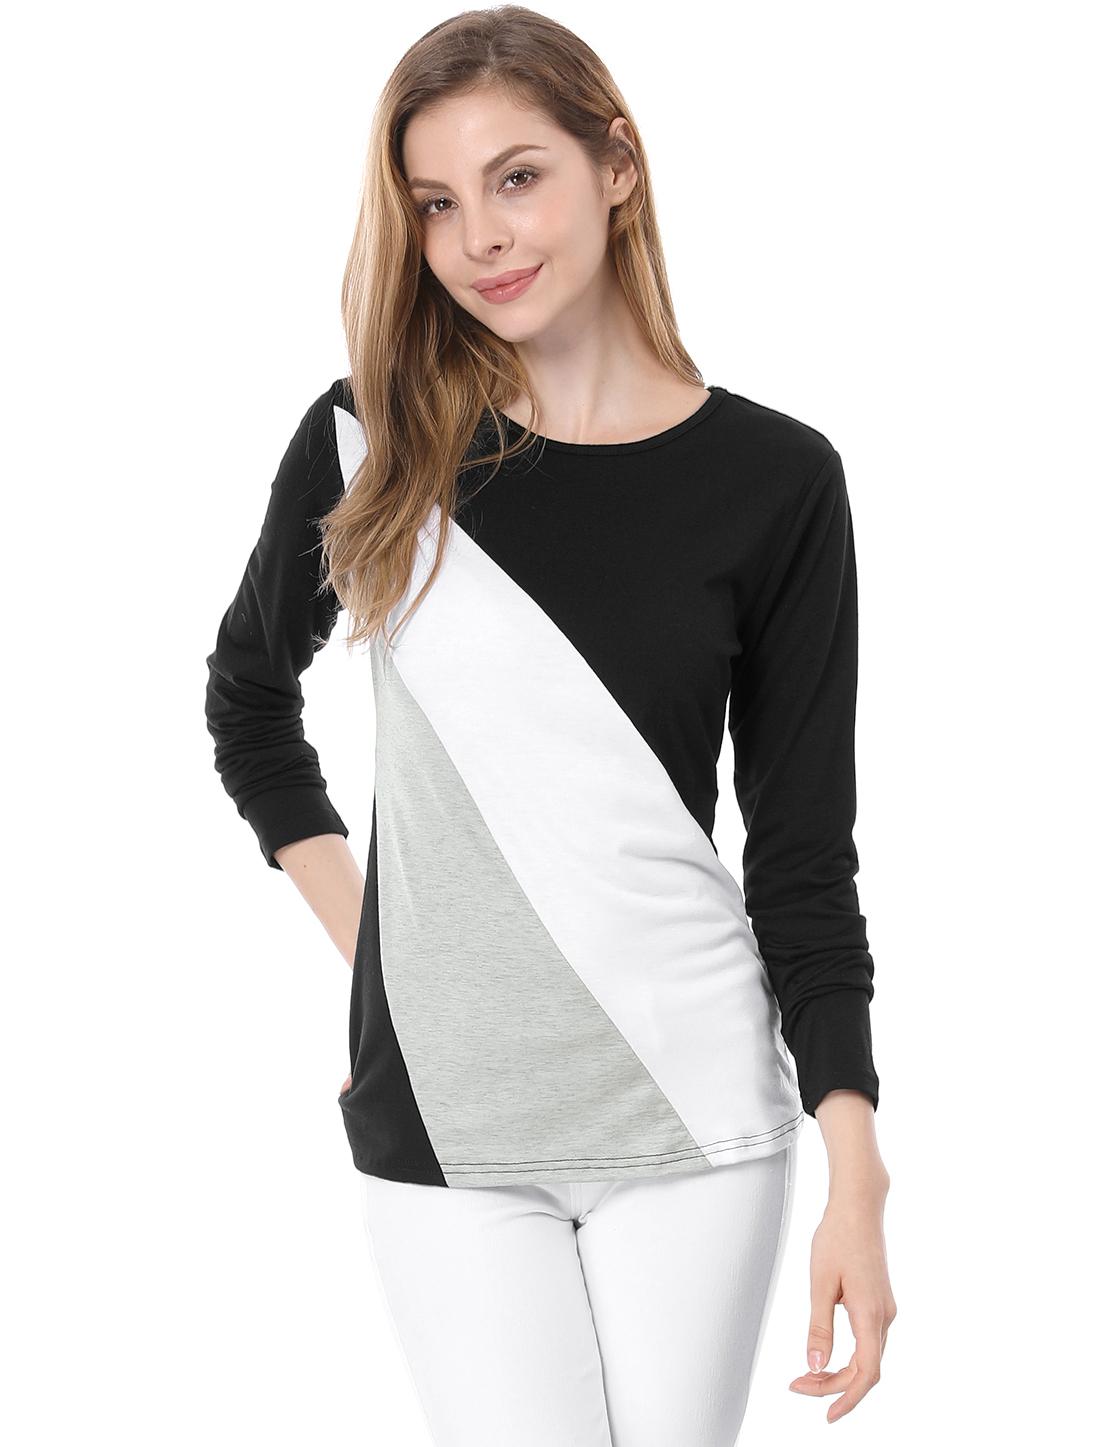 Women Color Block Long Sleeve Slim Fit Leisure T-Shirt Top Black White XS